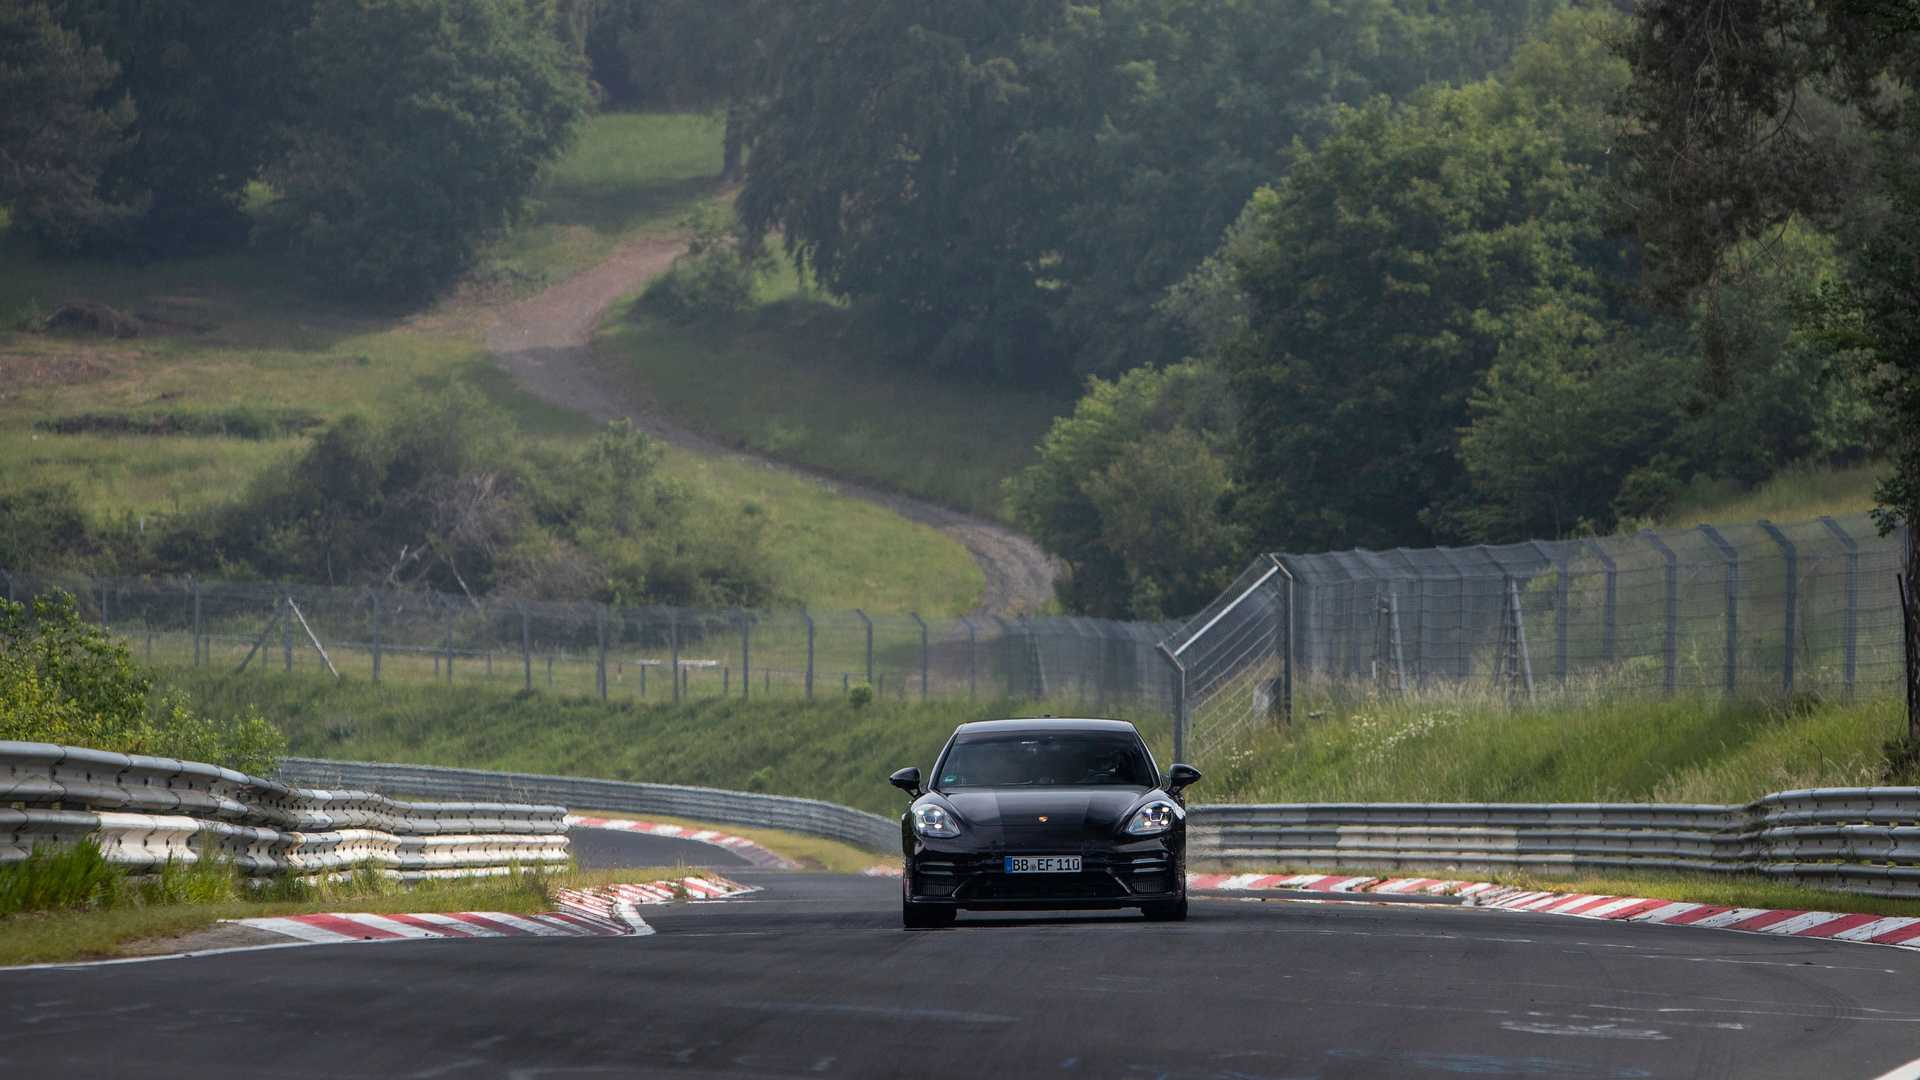 2021-porsche-panamera-sets-fastest-four-door-porsche-record-at-the-nurburgring-6